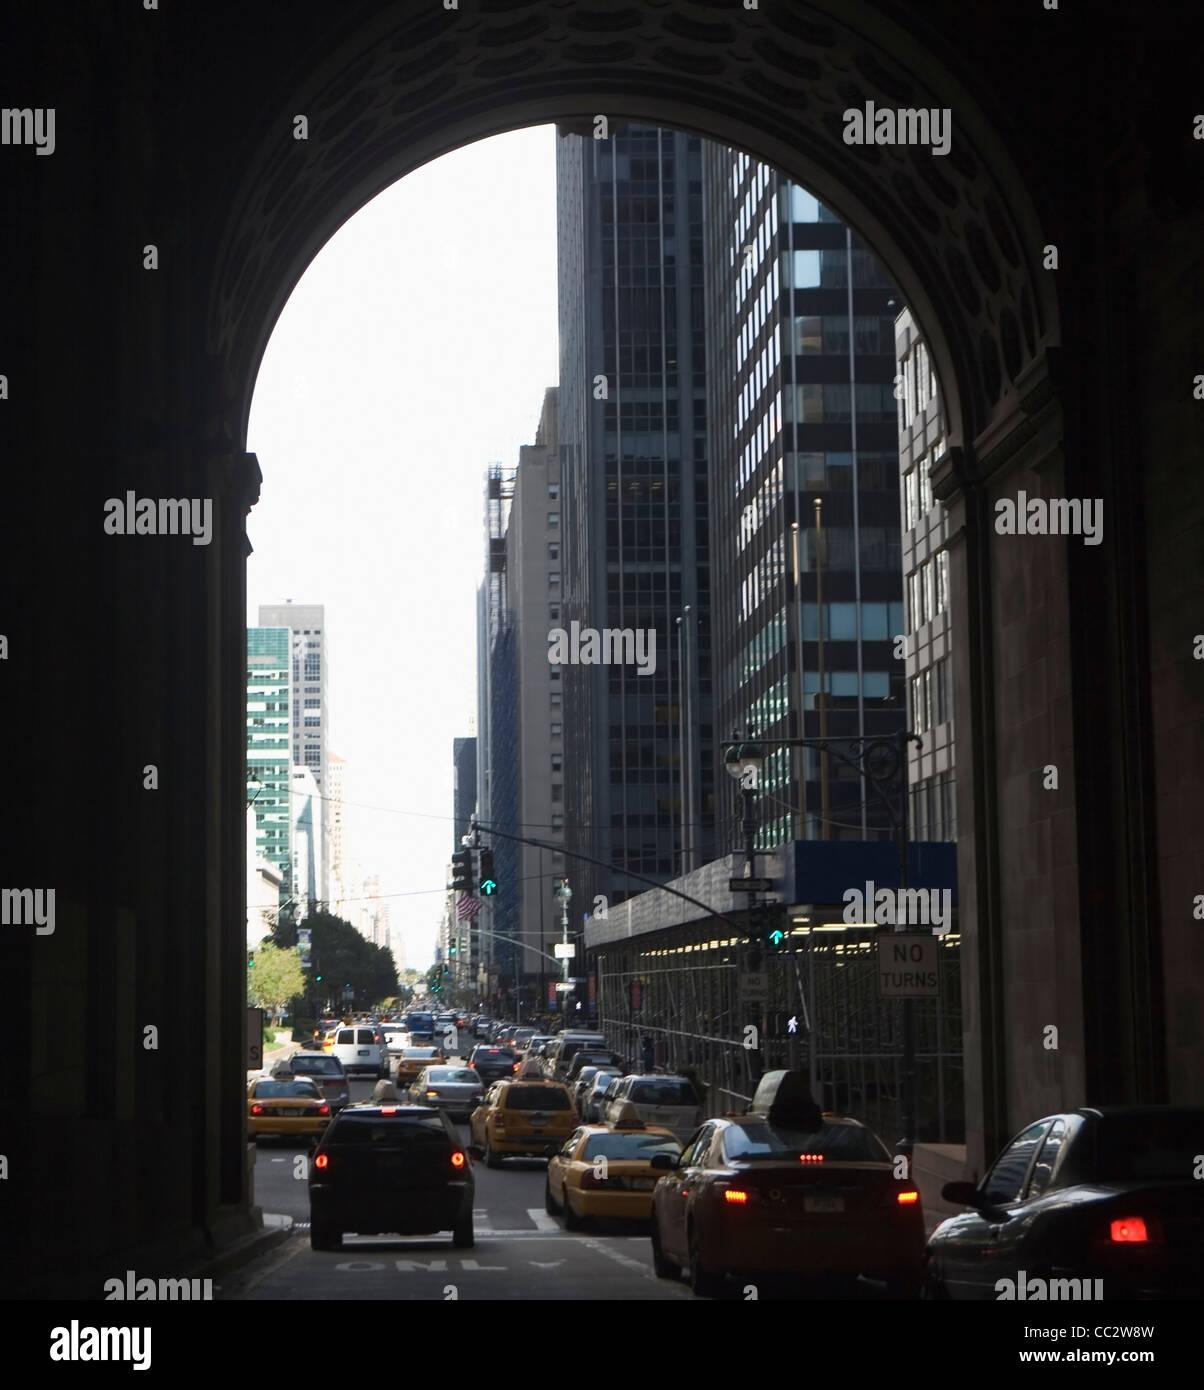 USA, New York State, New York City, City street - Stock Image